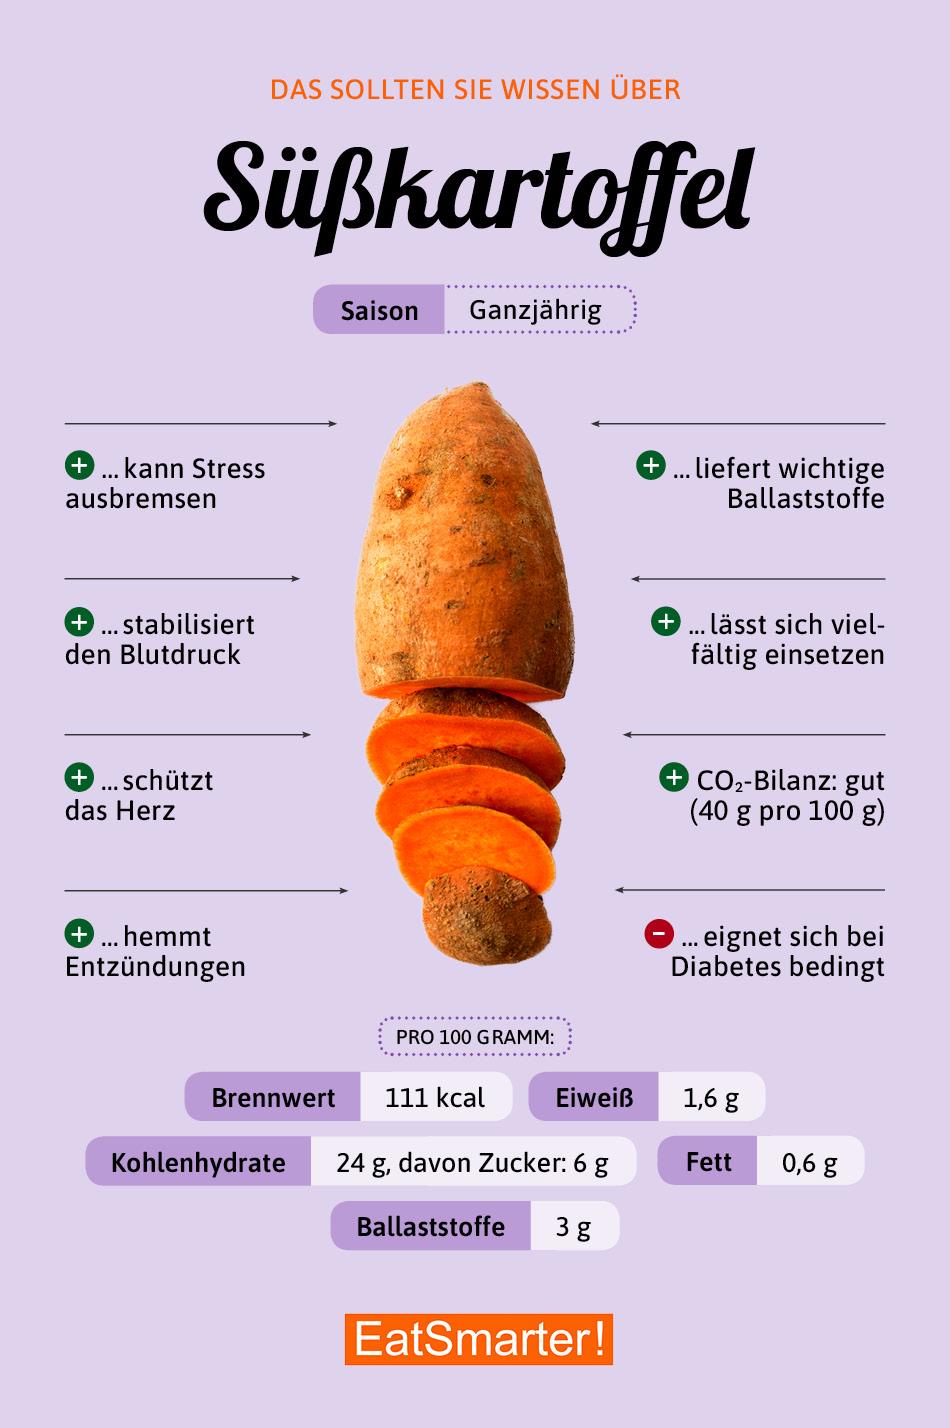 Warenkunde Süßkartoffel